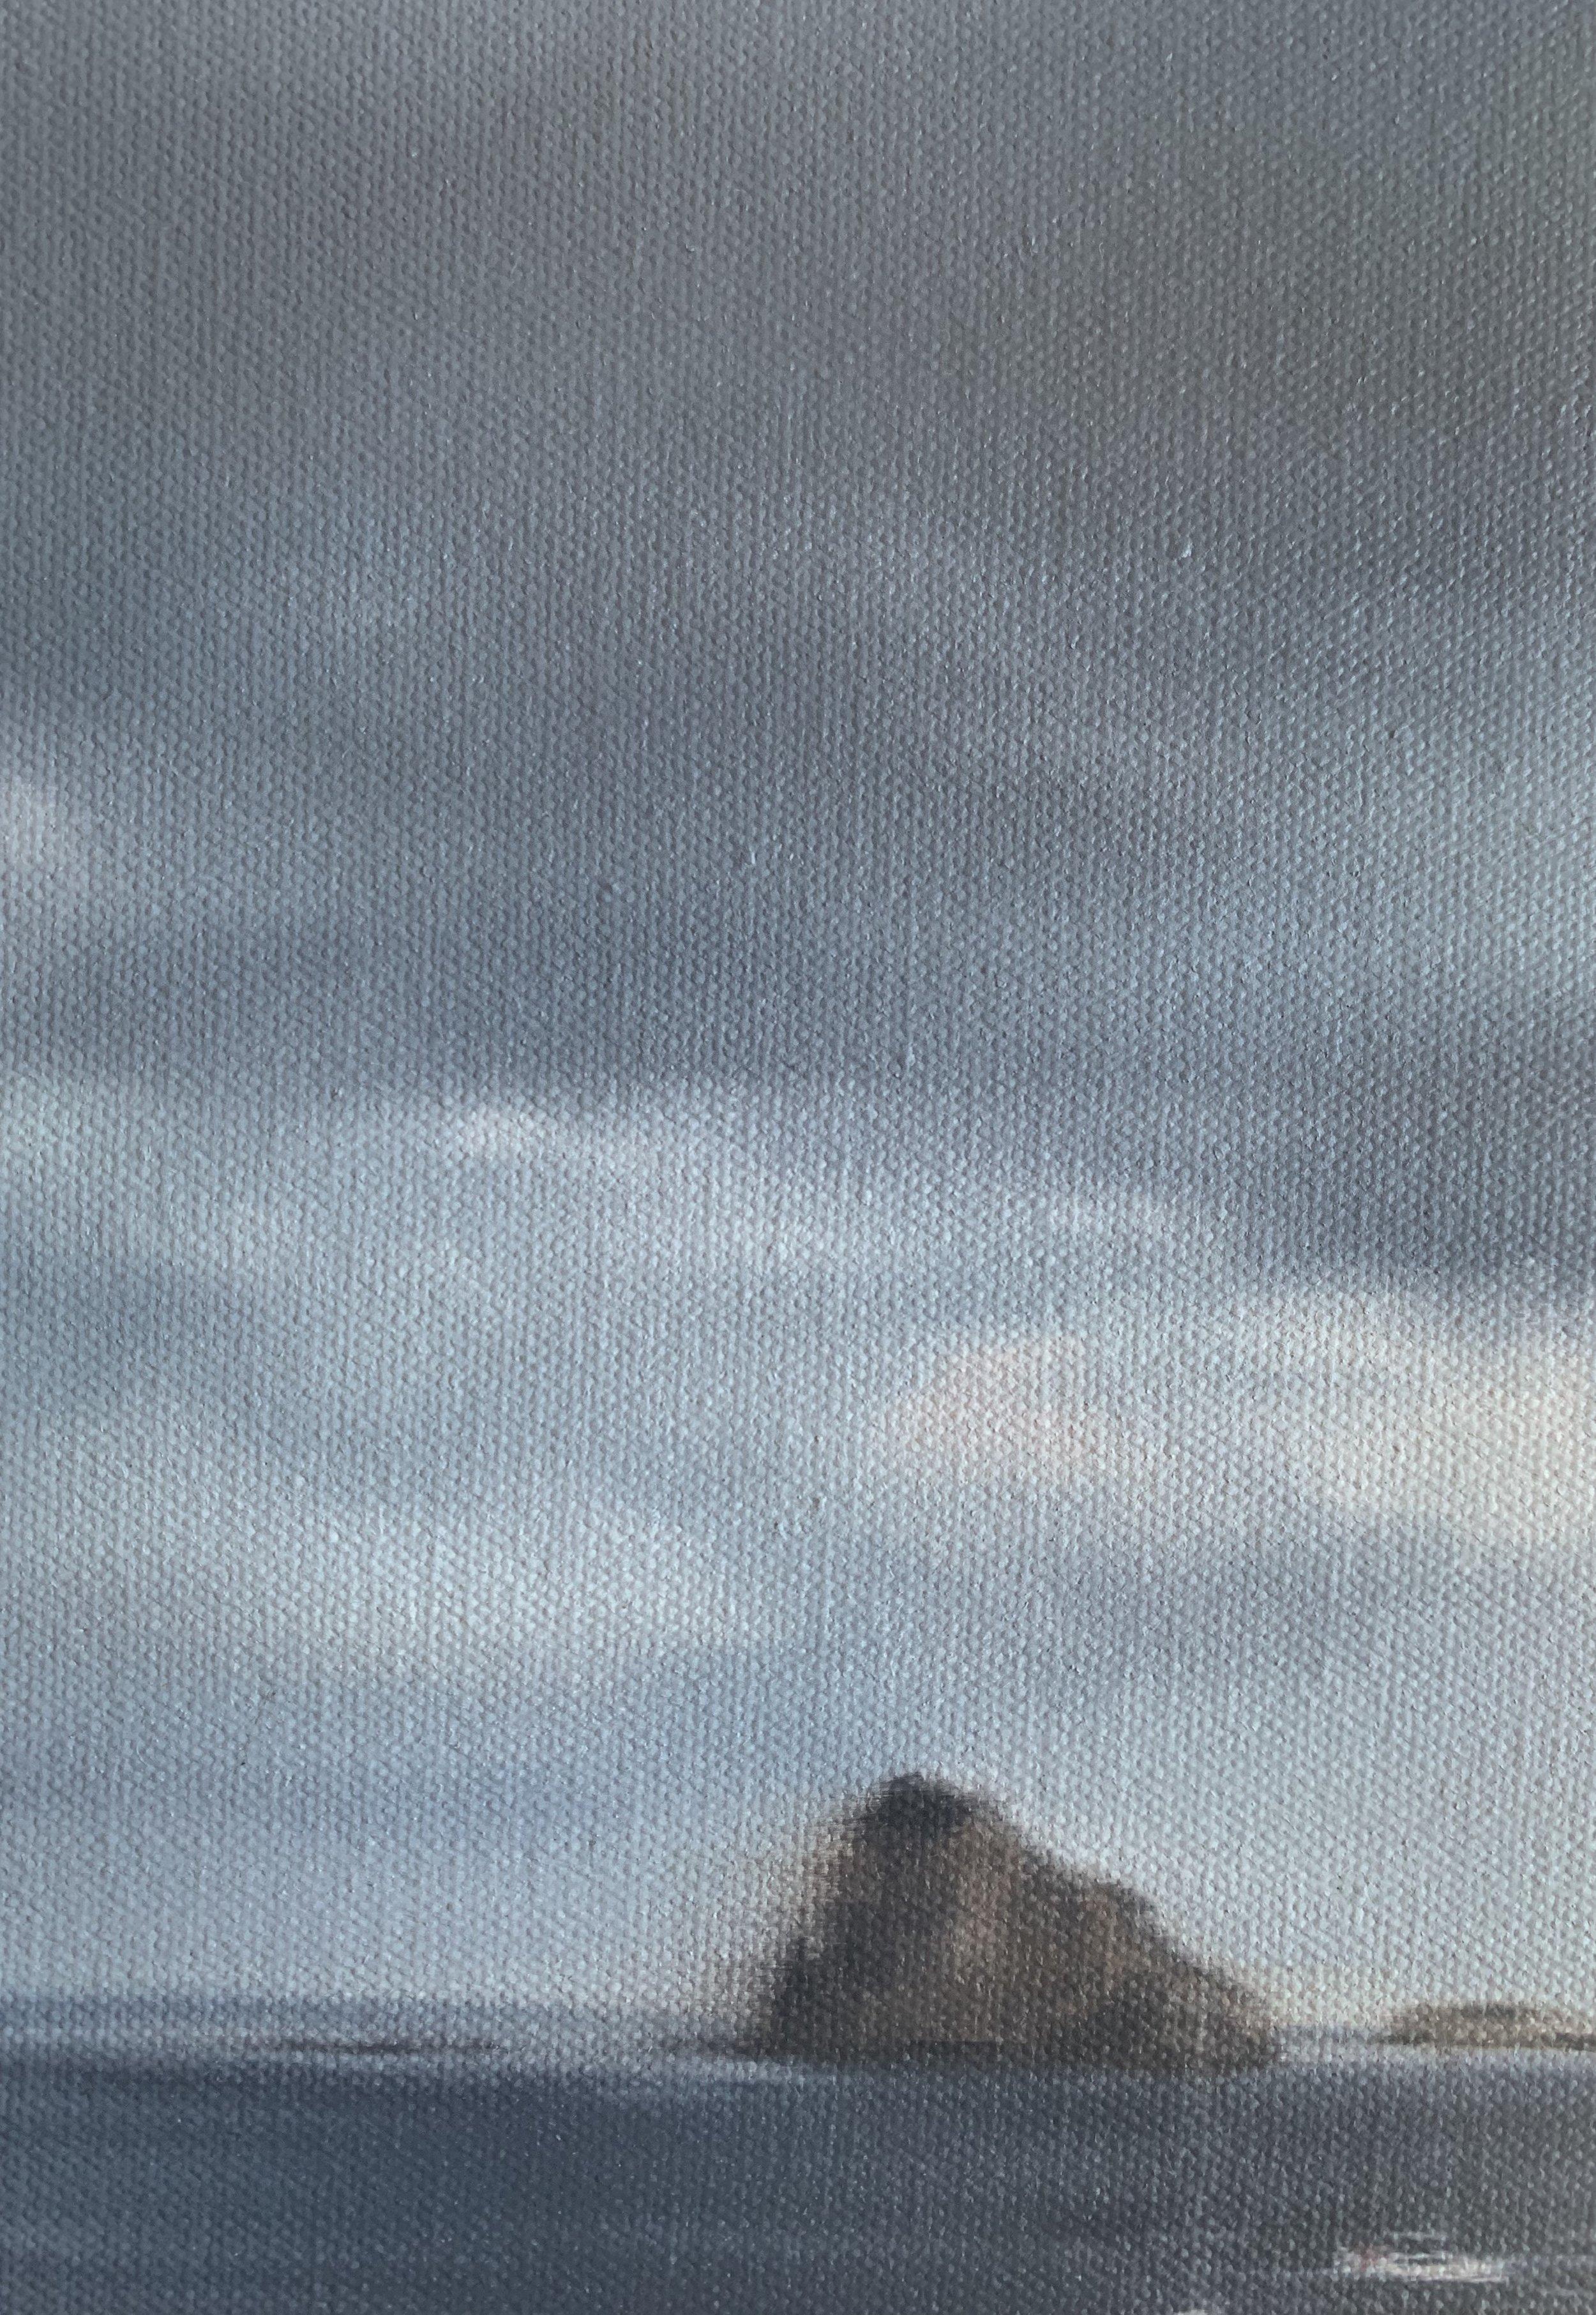 AMELIA CARROLL  image.81 , 2019 oil on canvas 18 x 12.5 cm